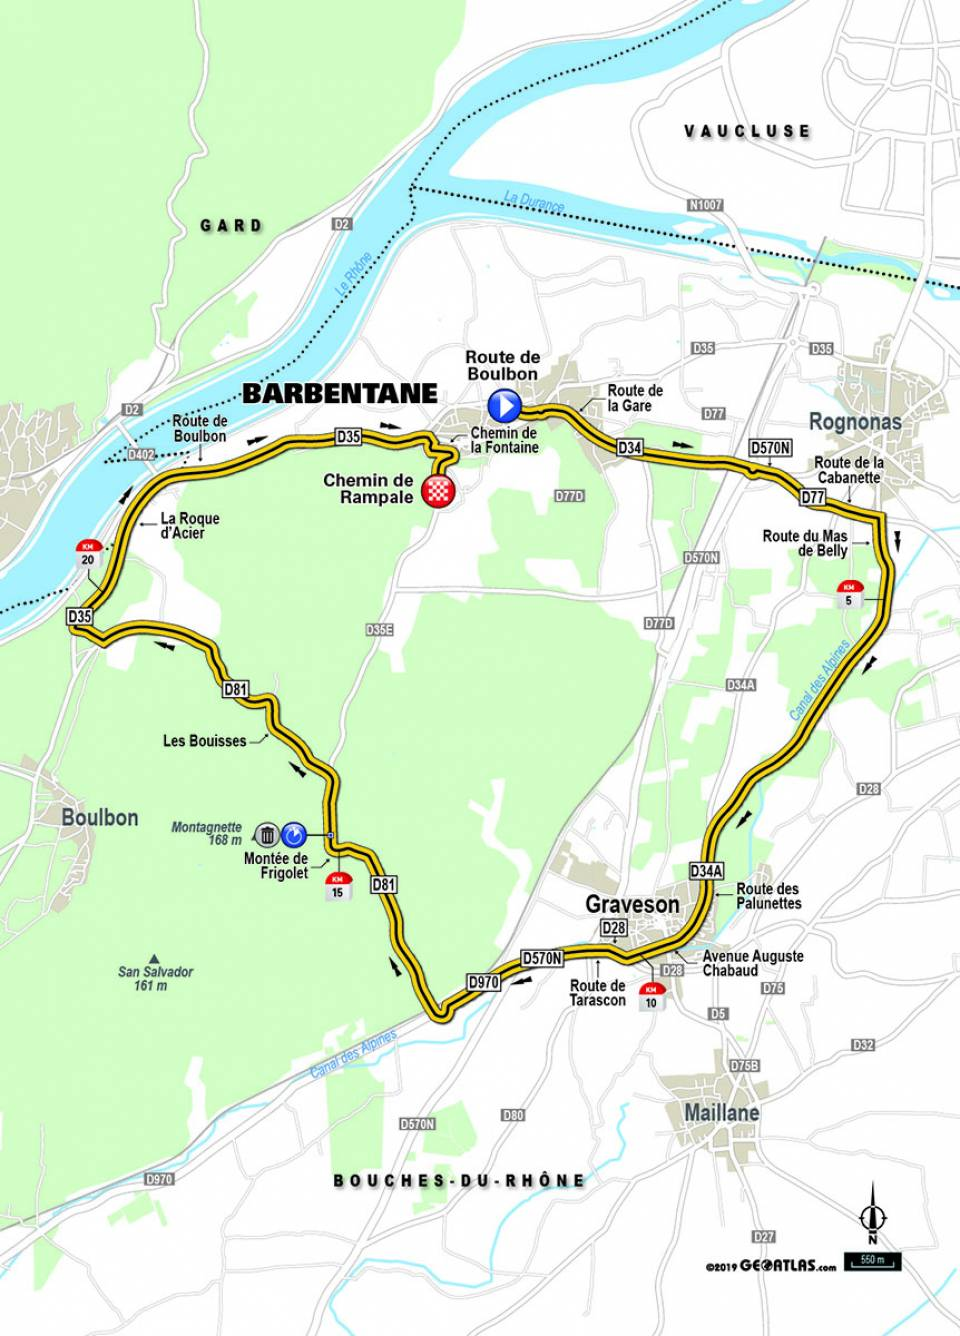 Streckenverlauf Paris - Nice 2019 - Etappe 5